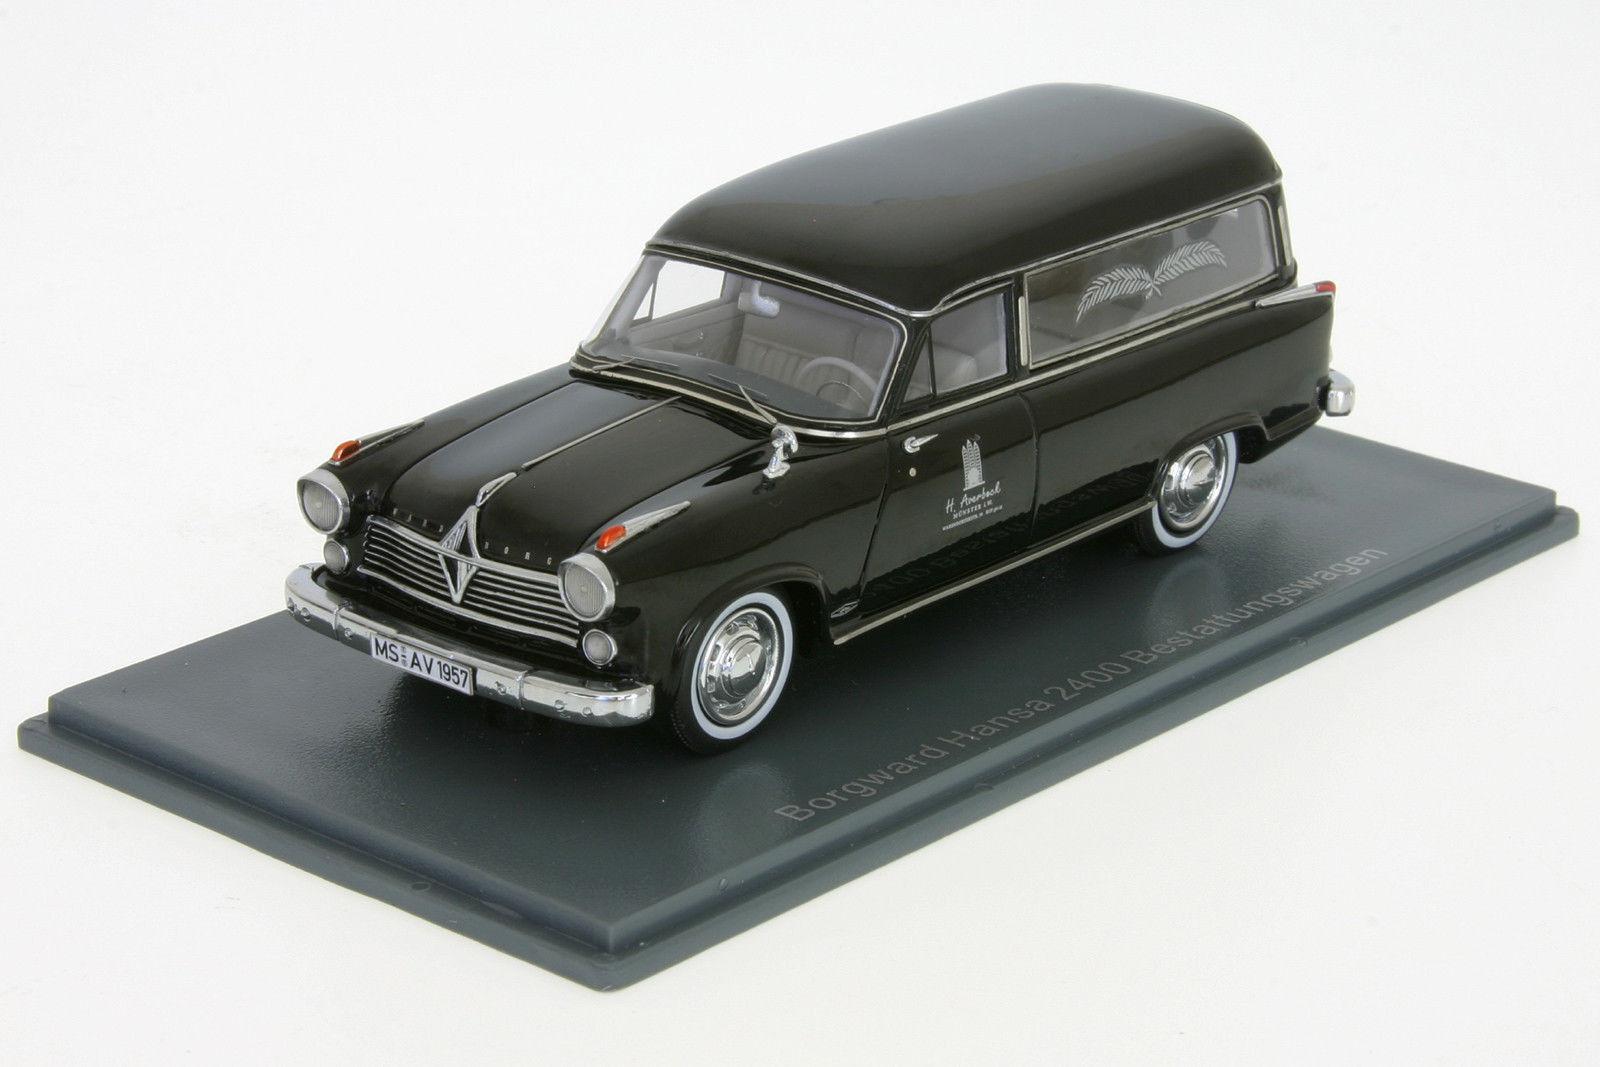 Borgward Hansa 2400 inhumation Voiture Bj. 1957 1 43 NEO 49520 Nouveau neuf dans sa boîte